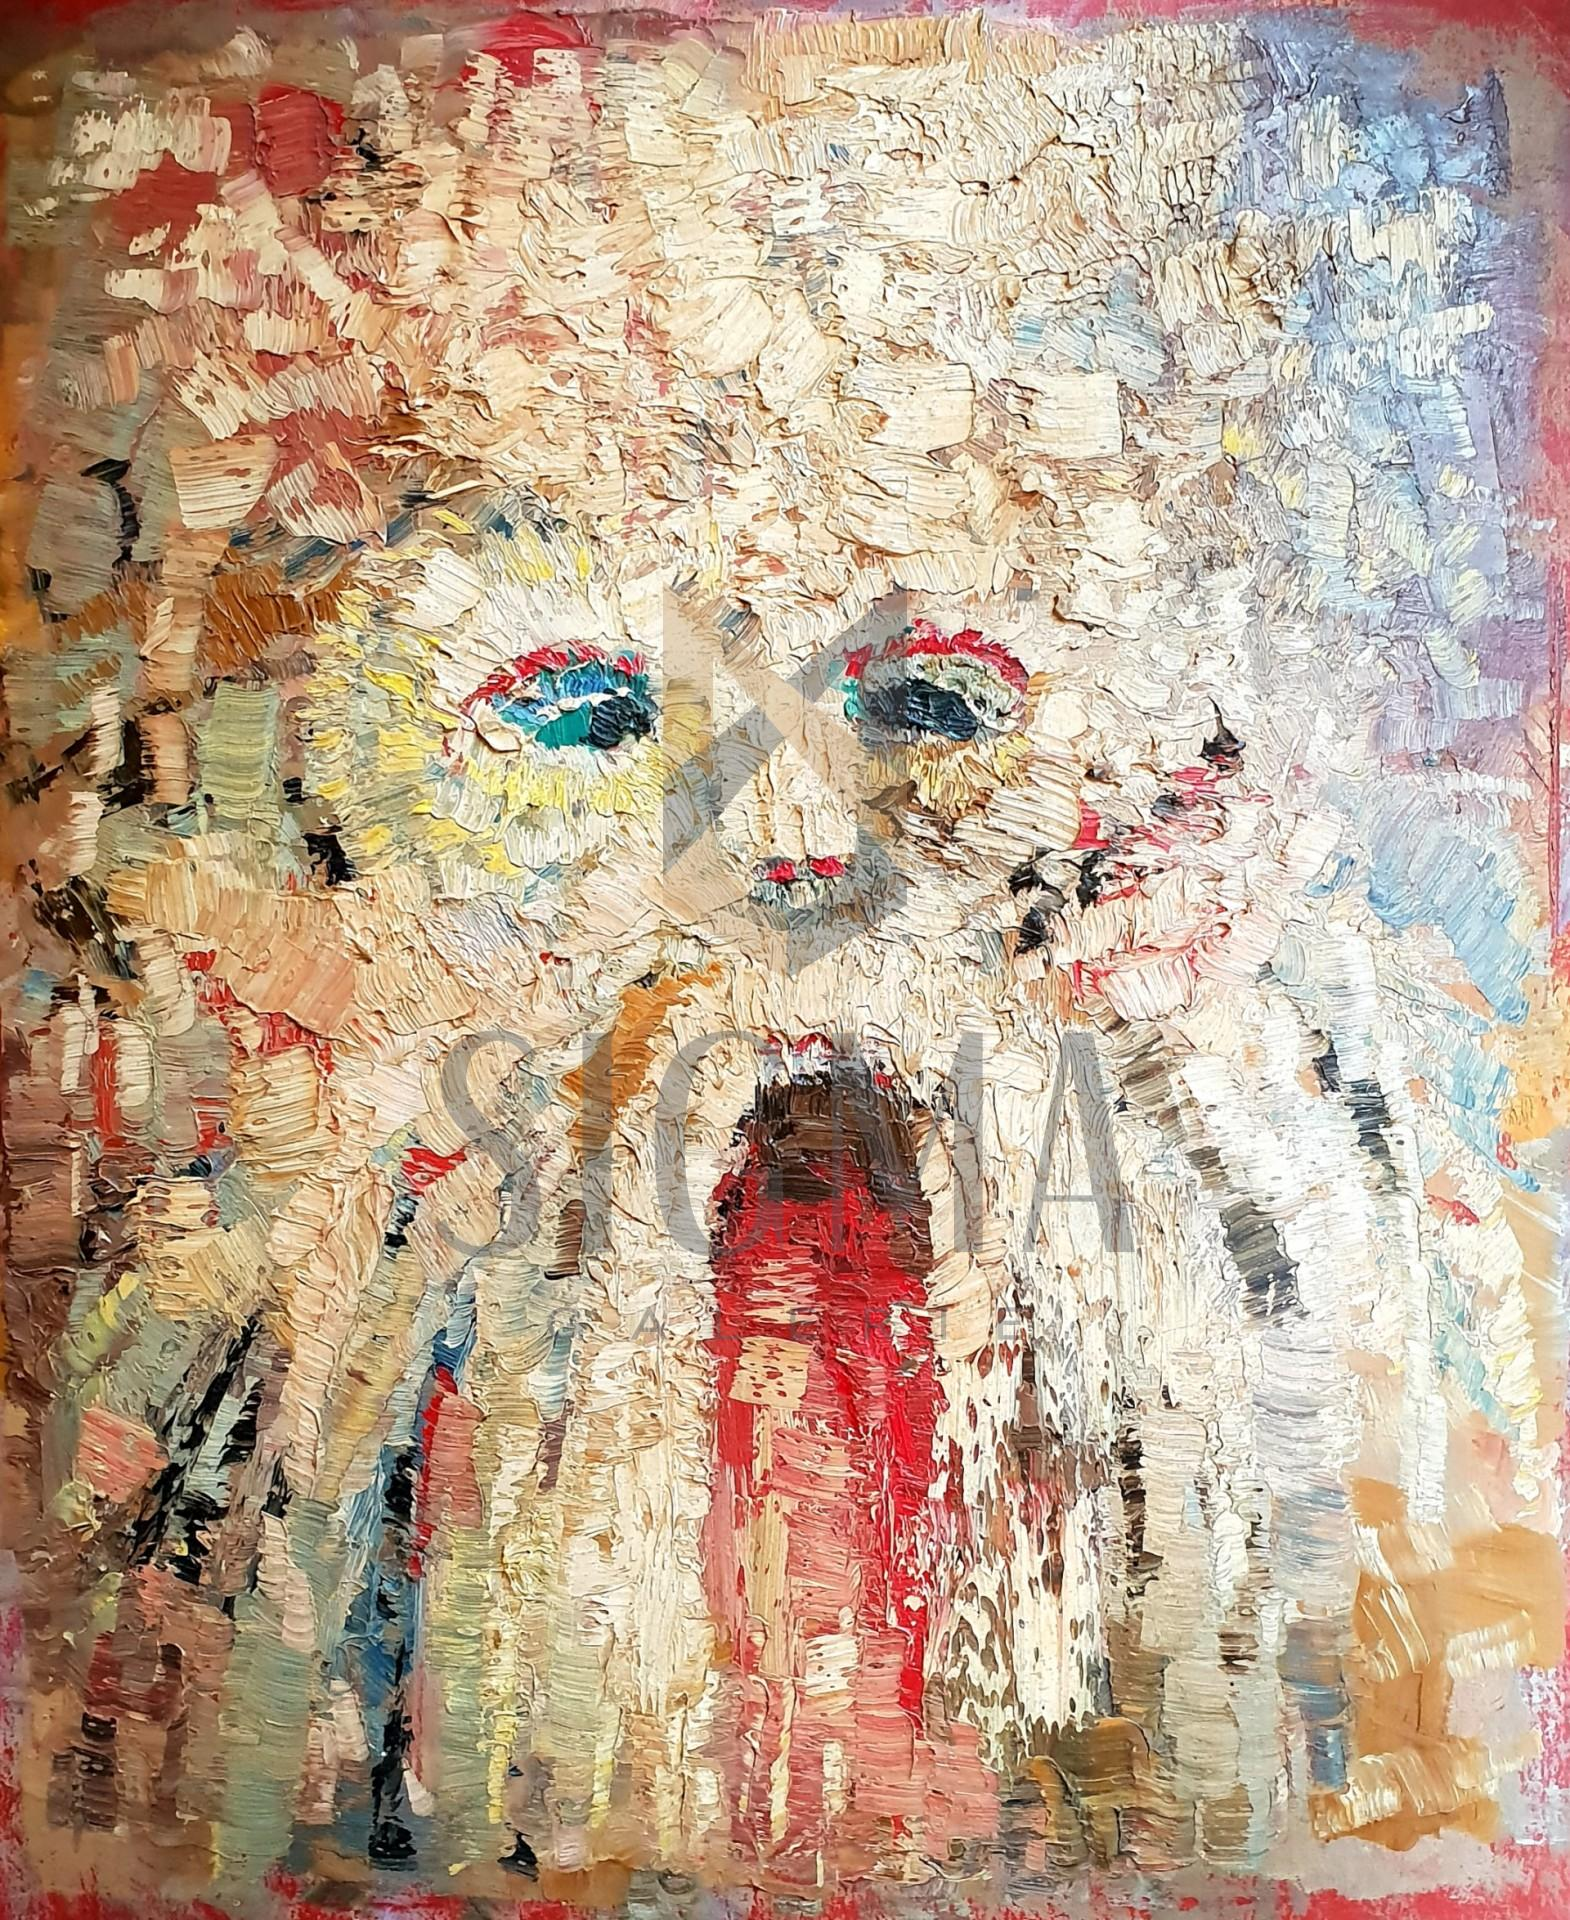 Tablou, - Masca traditionala -, ulei pe carton, 39x32,5 cm, lucrare nesemnata